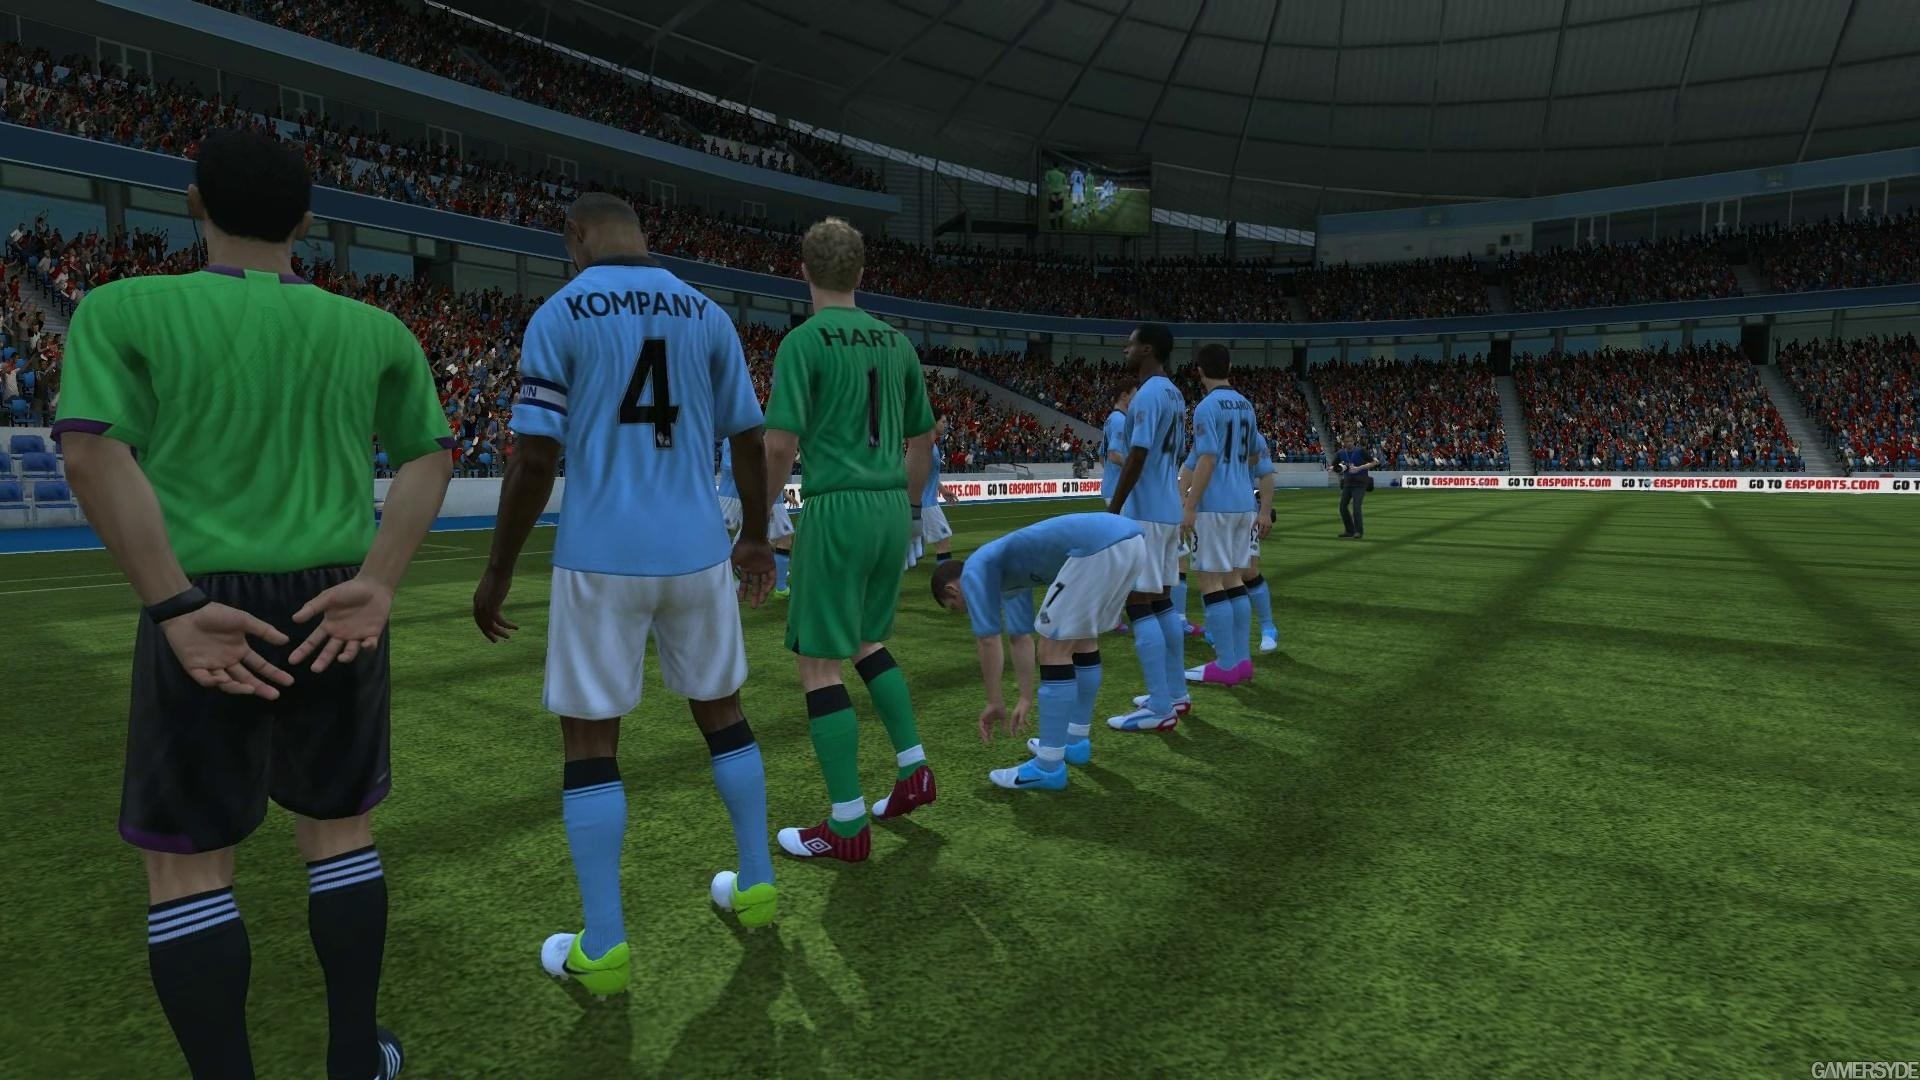 image fifa 13 20261 2509 0006 تصاویر جدید از بازی FIFA 13